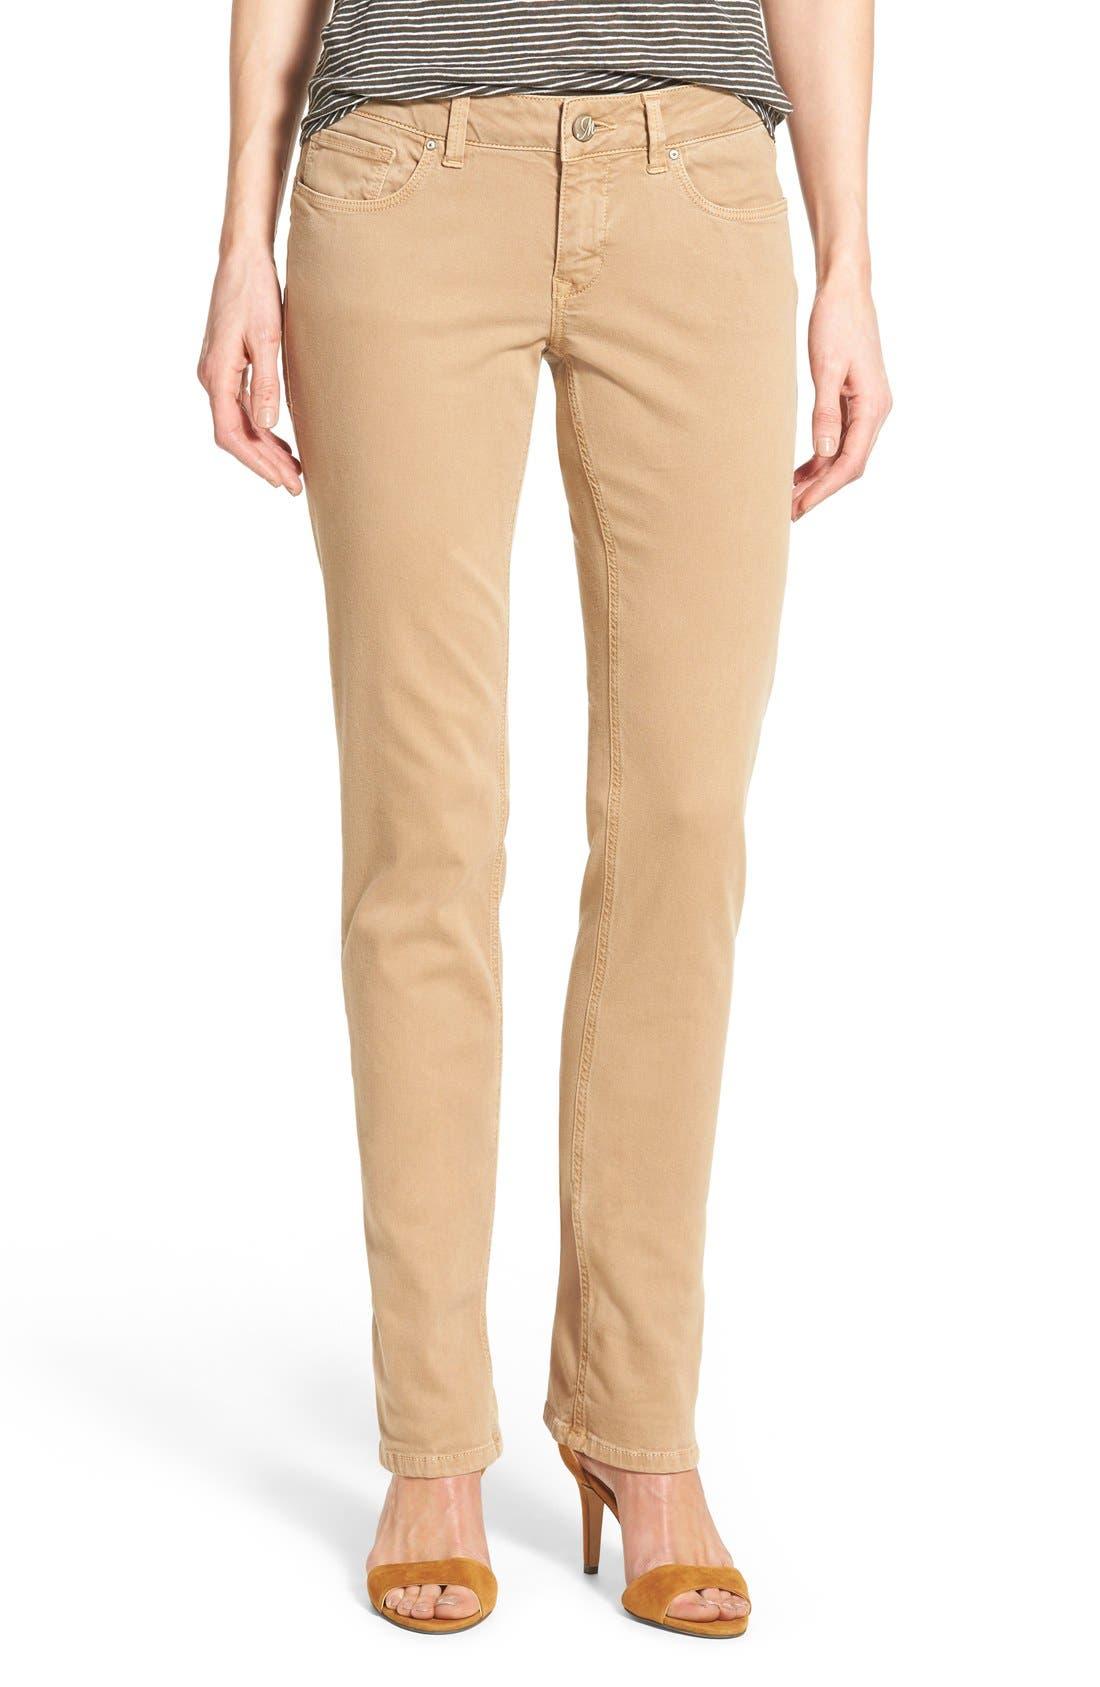 Mavi Jeans 'Emma' Stretch Twill Slim Boyfriend Pants